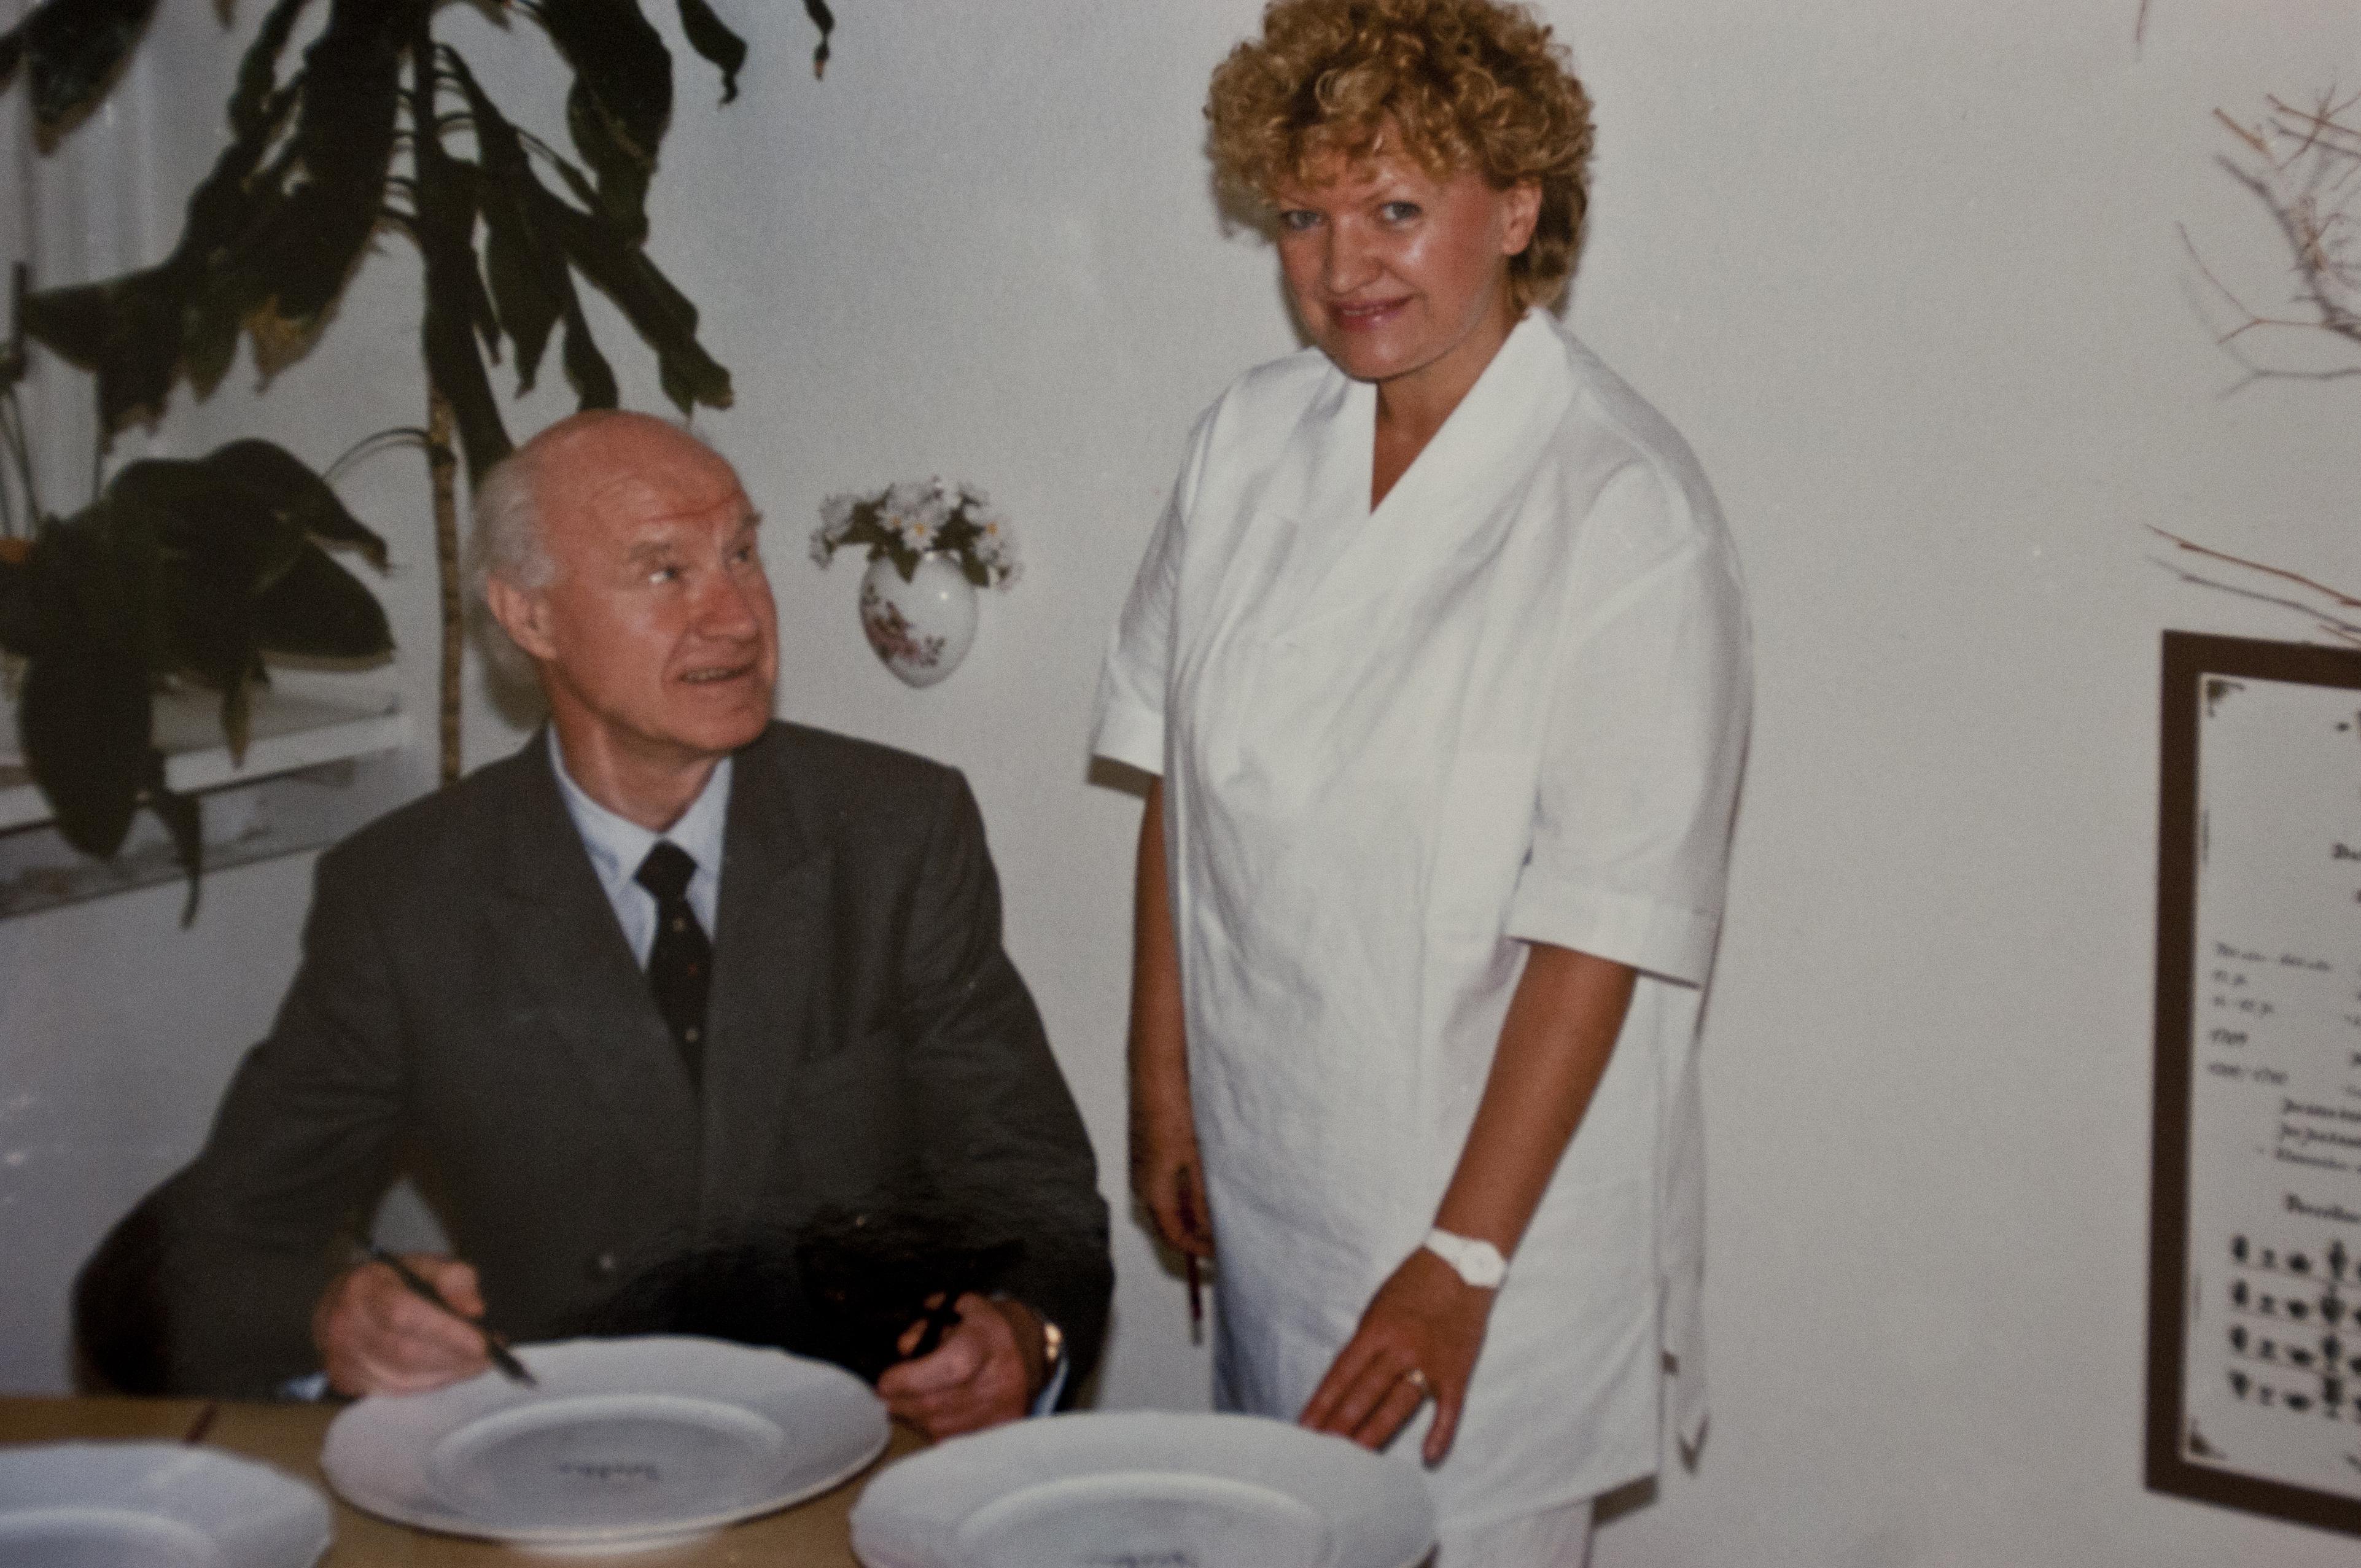 Herbert Dau - ehem. Landtagspräsident Hamburg - mit Annerose Köneke - Porzellanmalerin